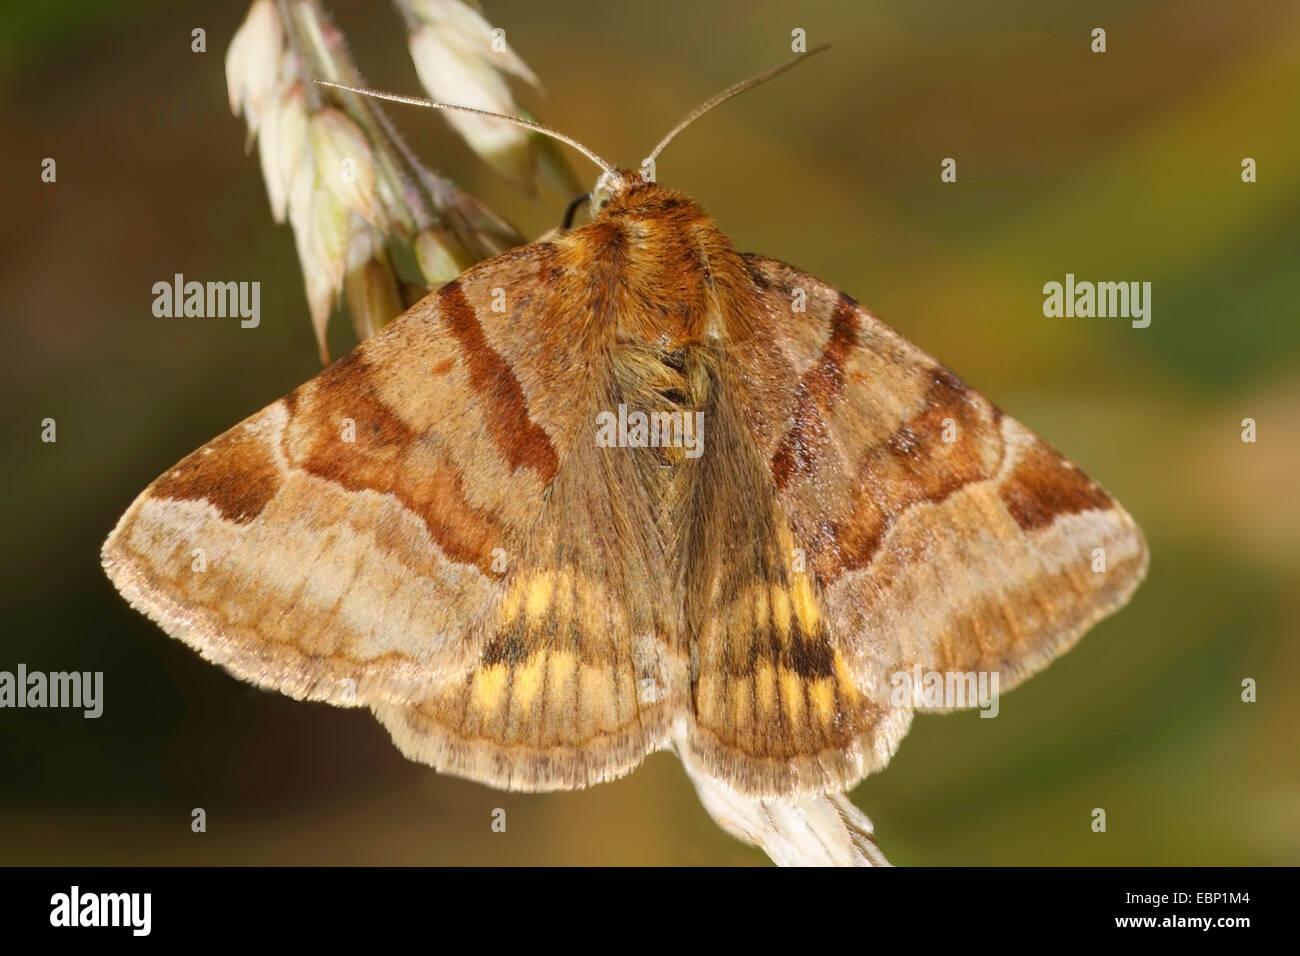 Burnet Companion (Ectypa, glyphica Euclidia glyphica), sur une inflorescence en herbe, Allemagne Photo Stock